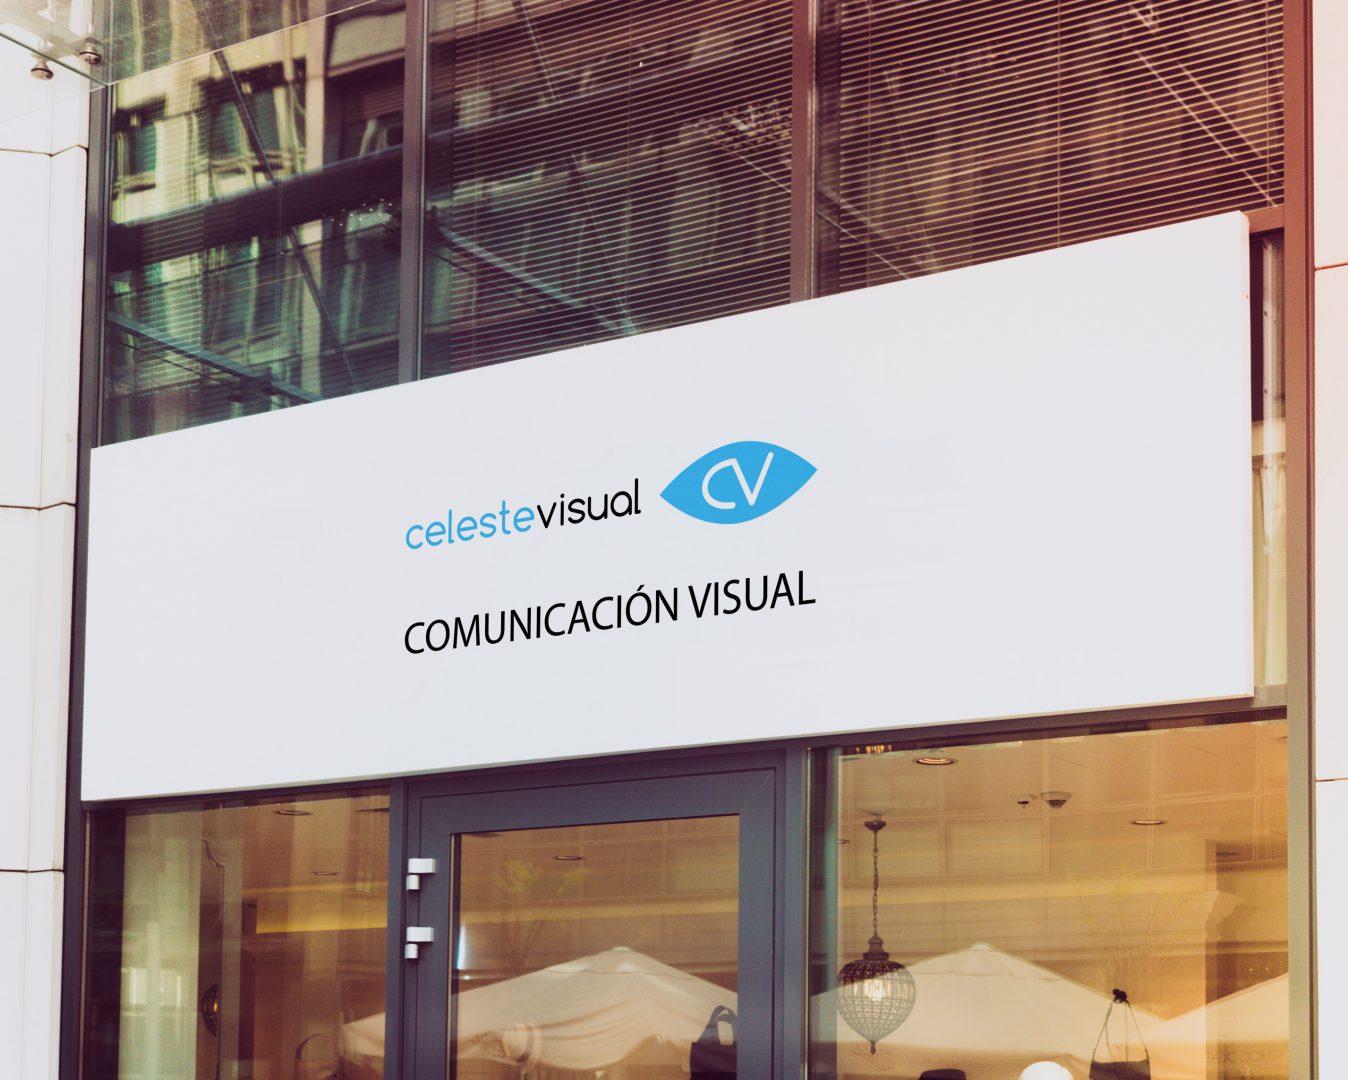 celestevisual-tienda